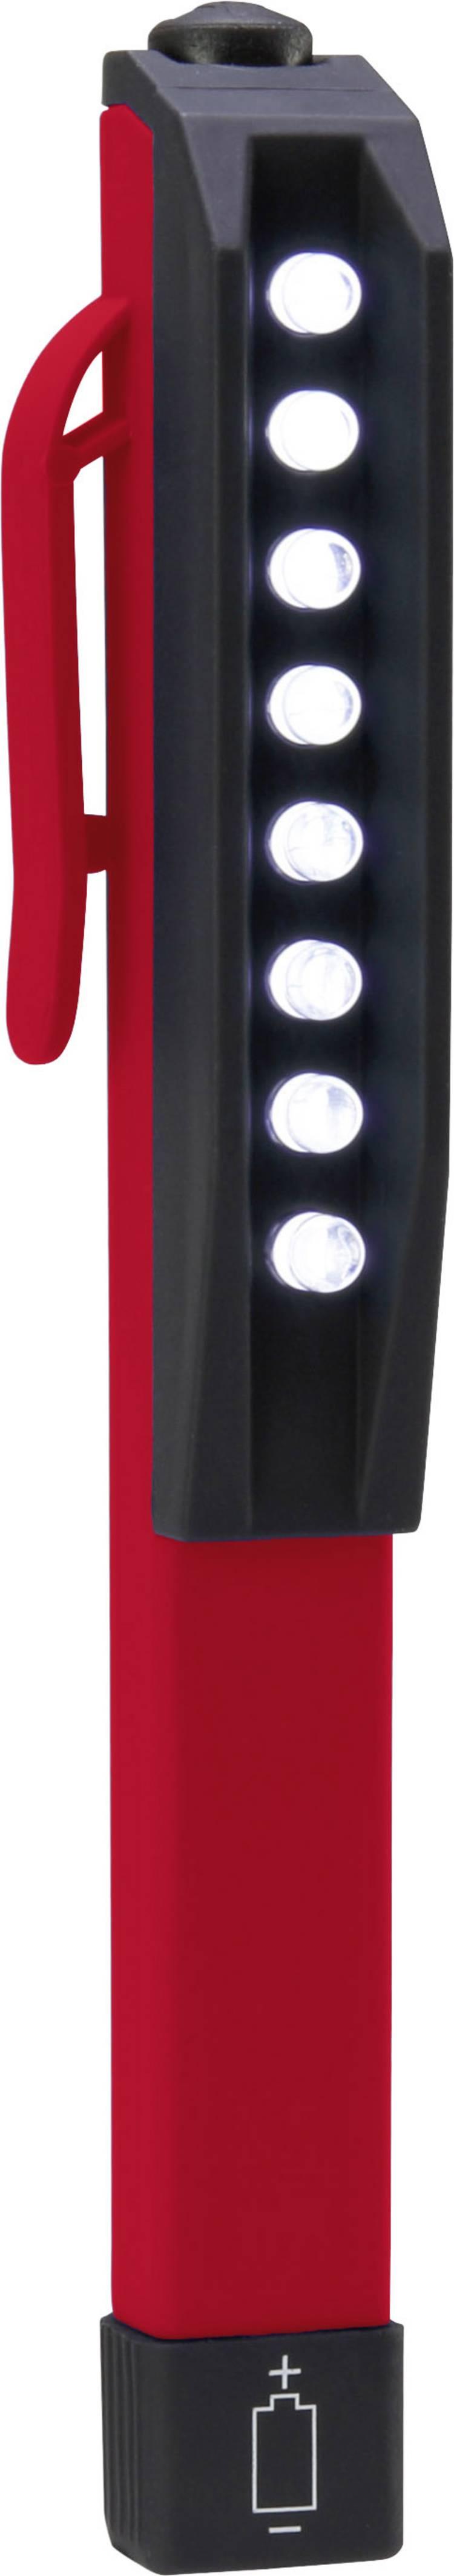 LED Penlightlamp werkt op batterijen TOOLCRAFT 1439002